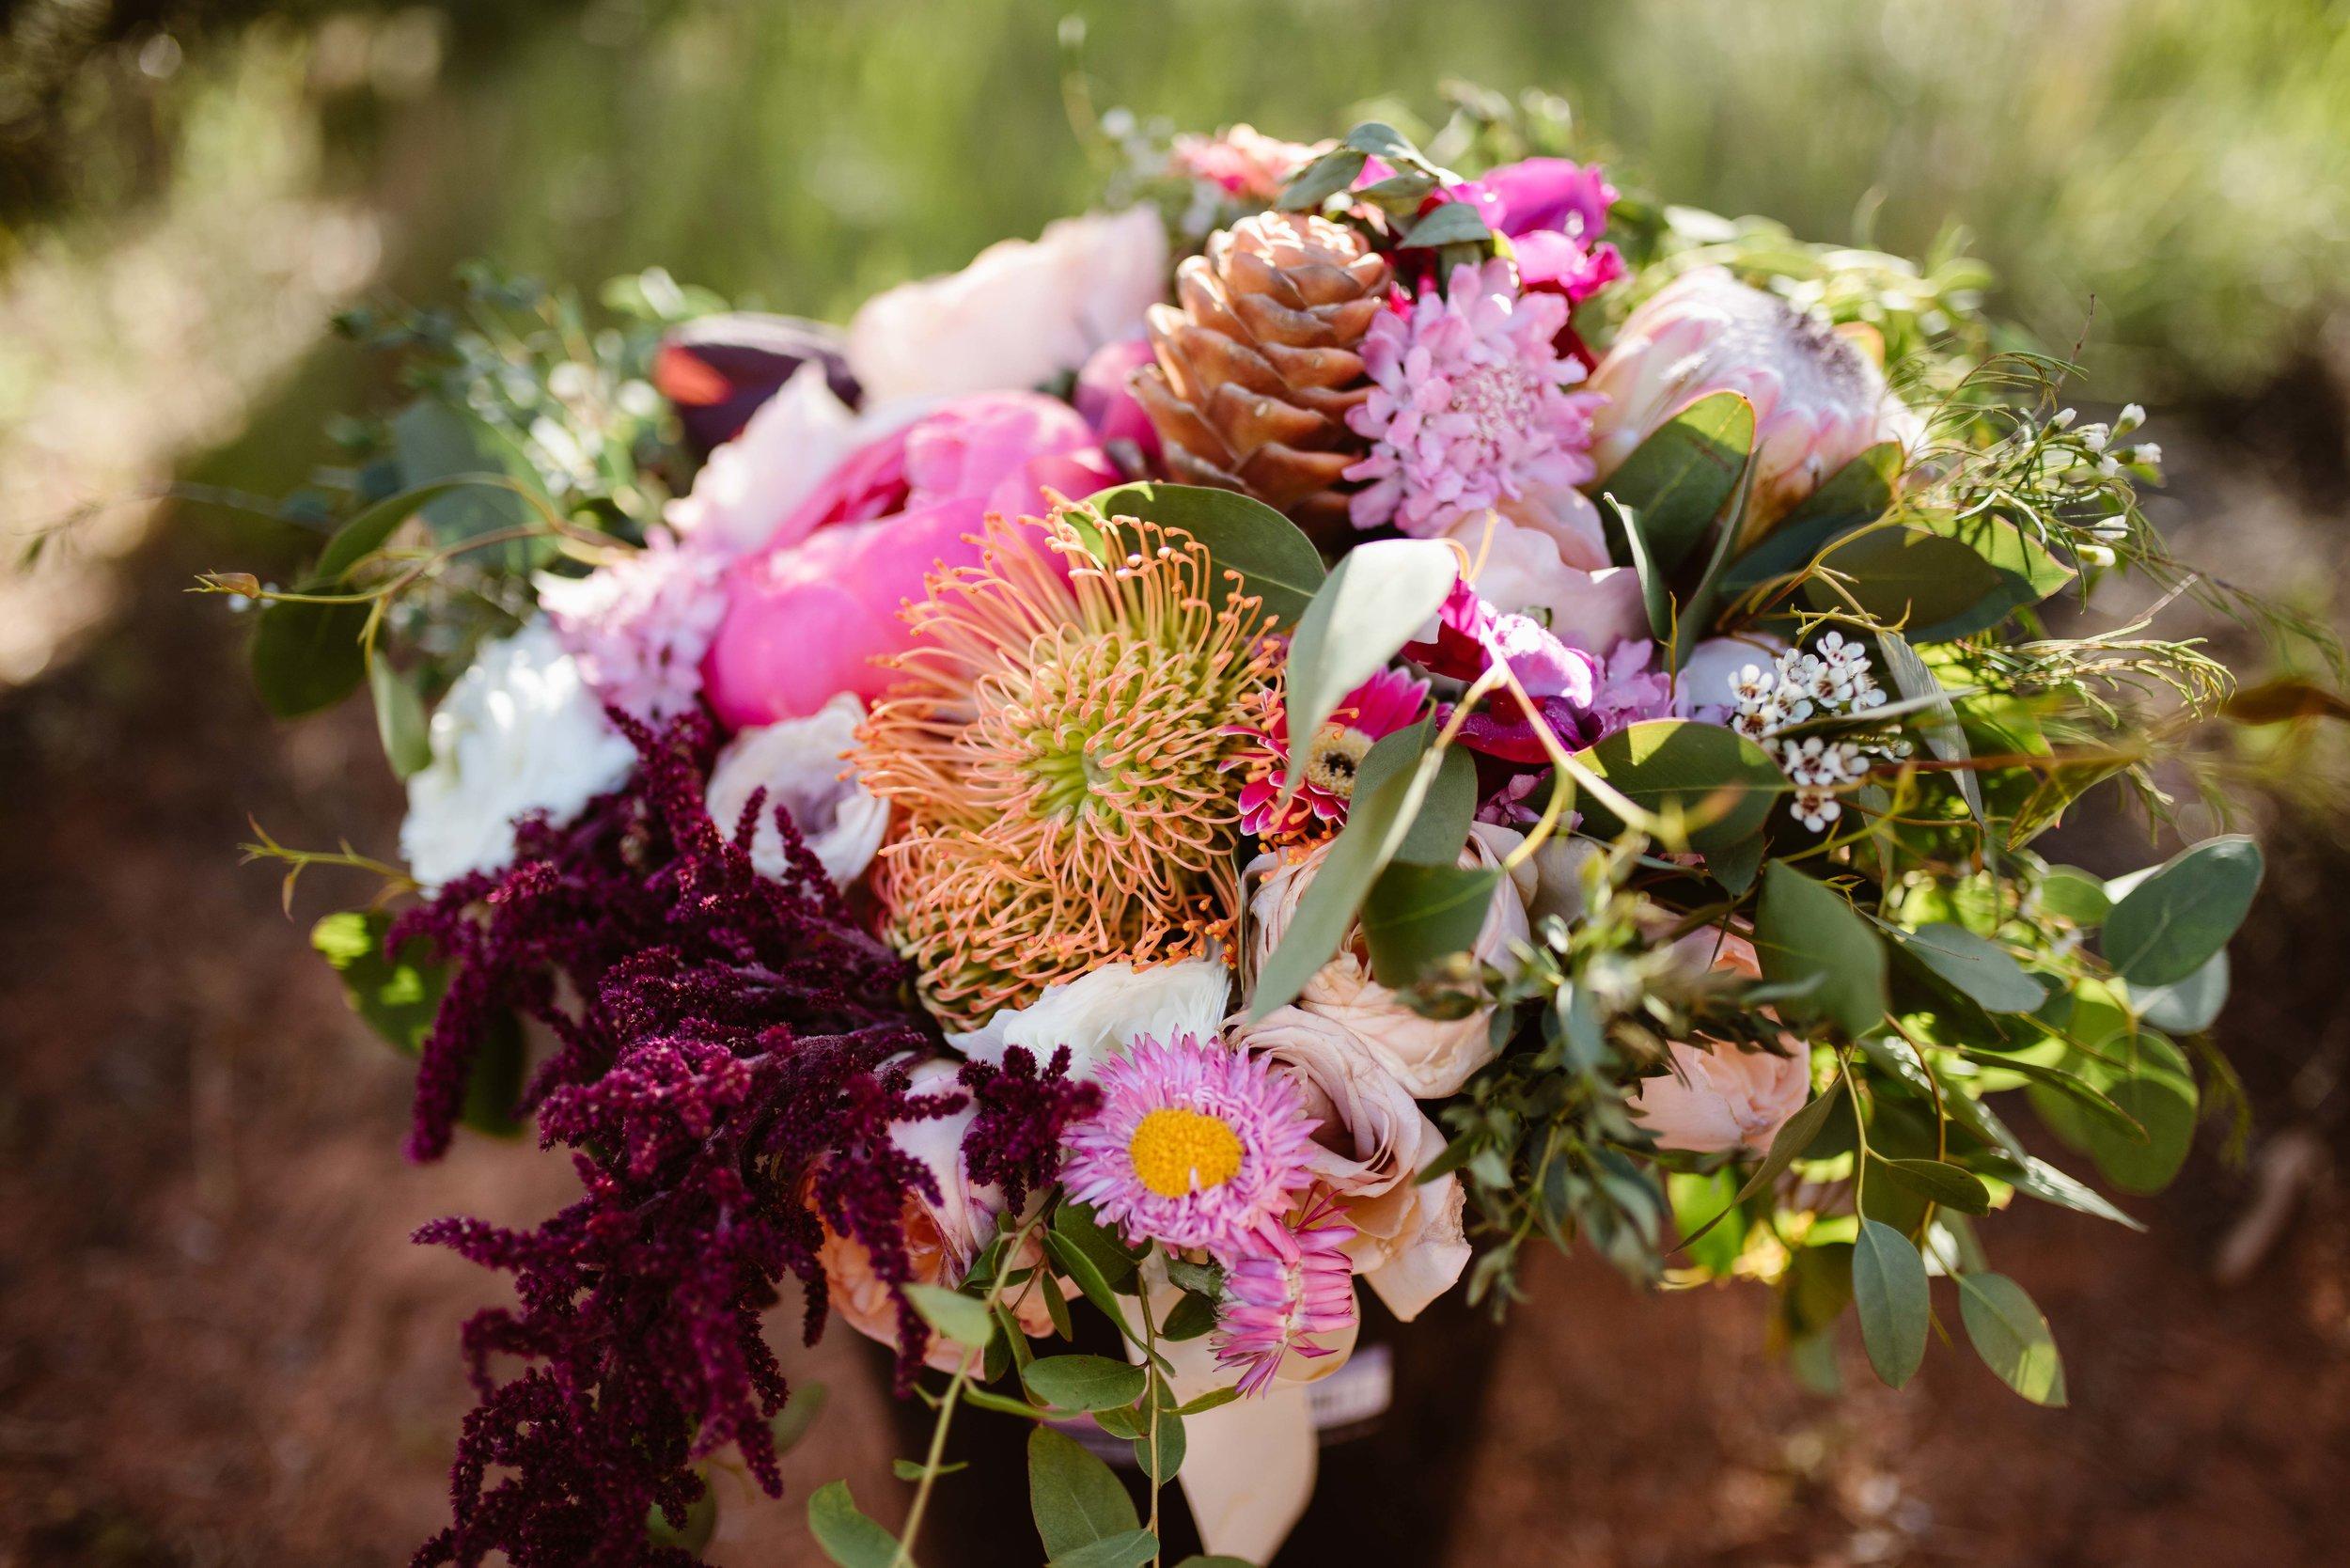 sedona-elopement-flowers